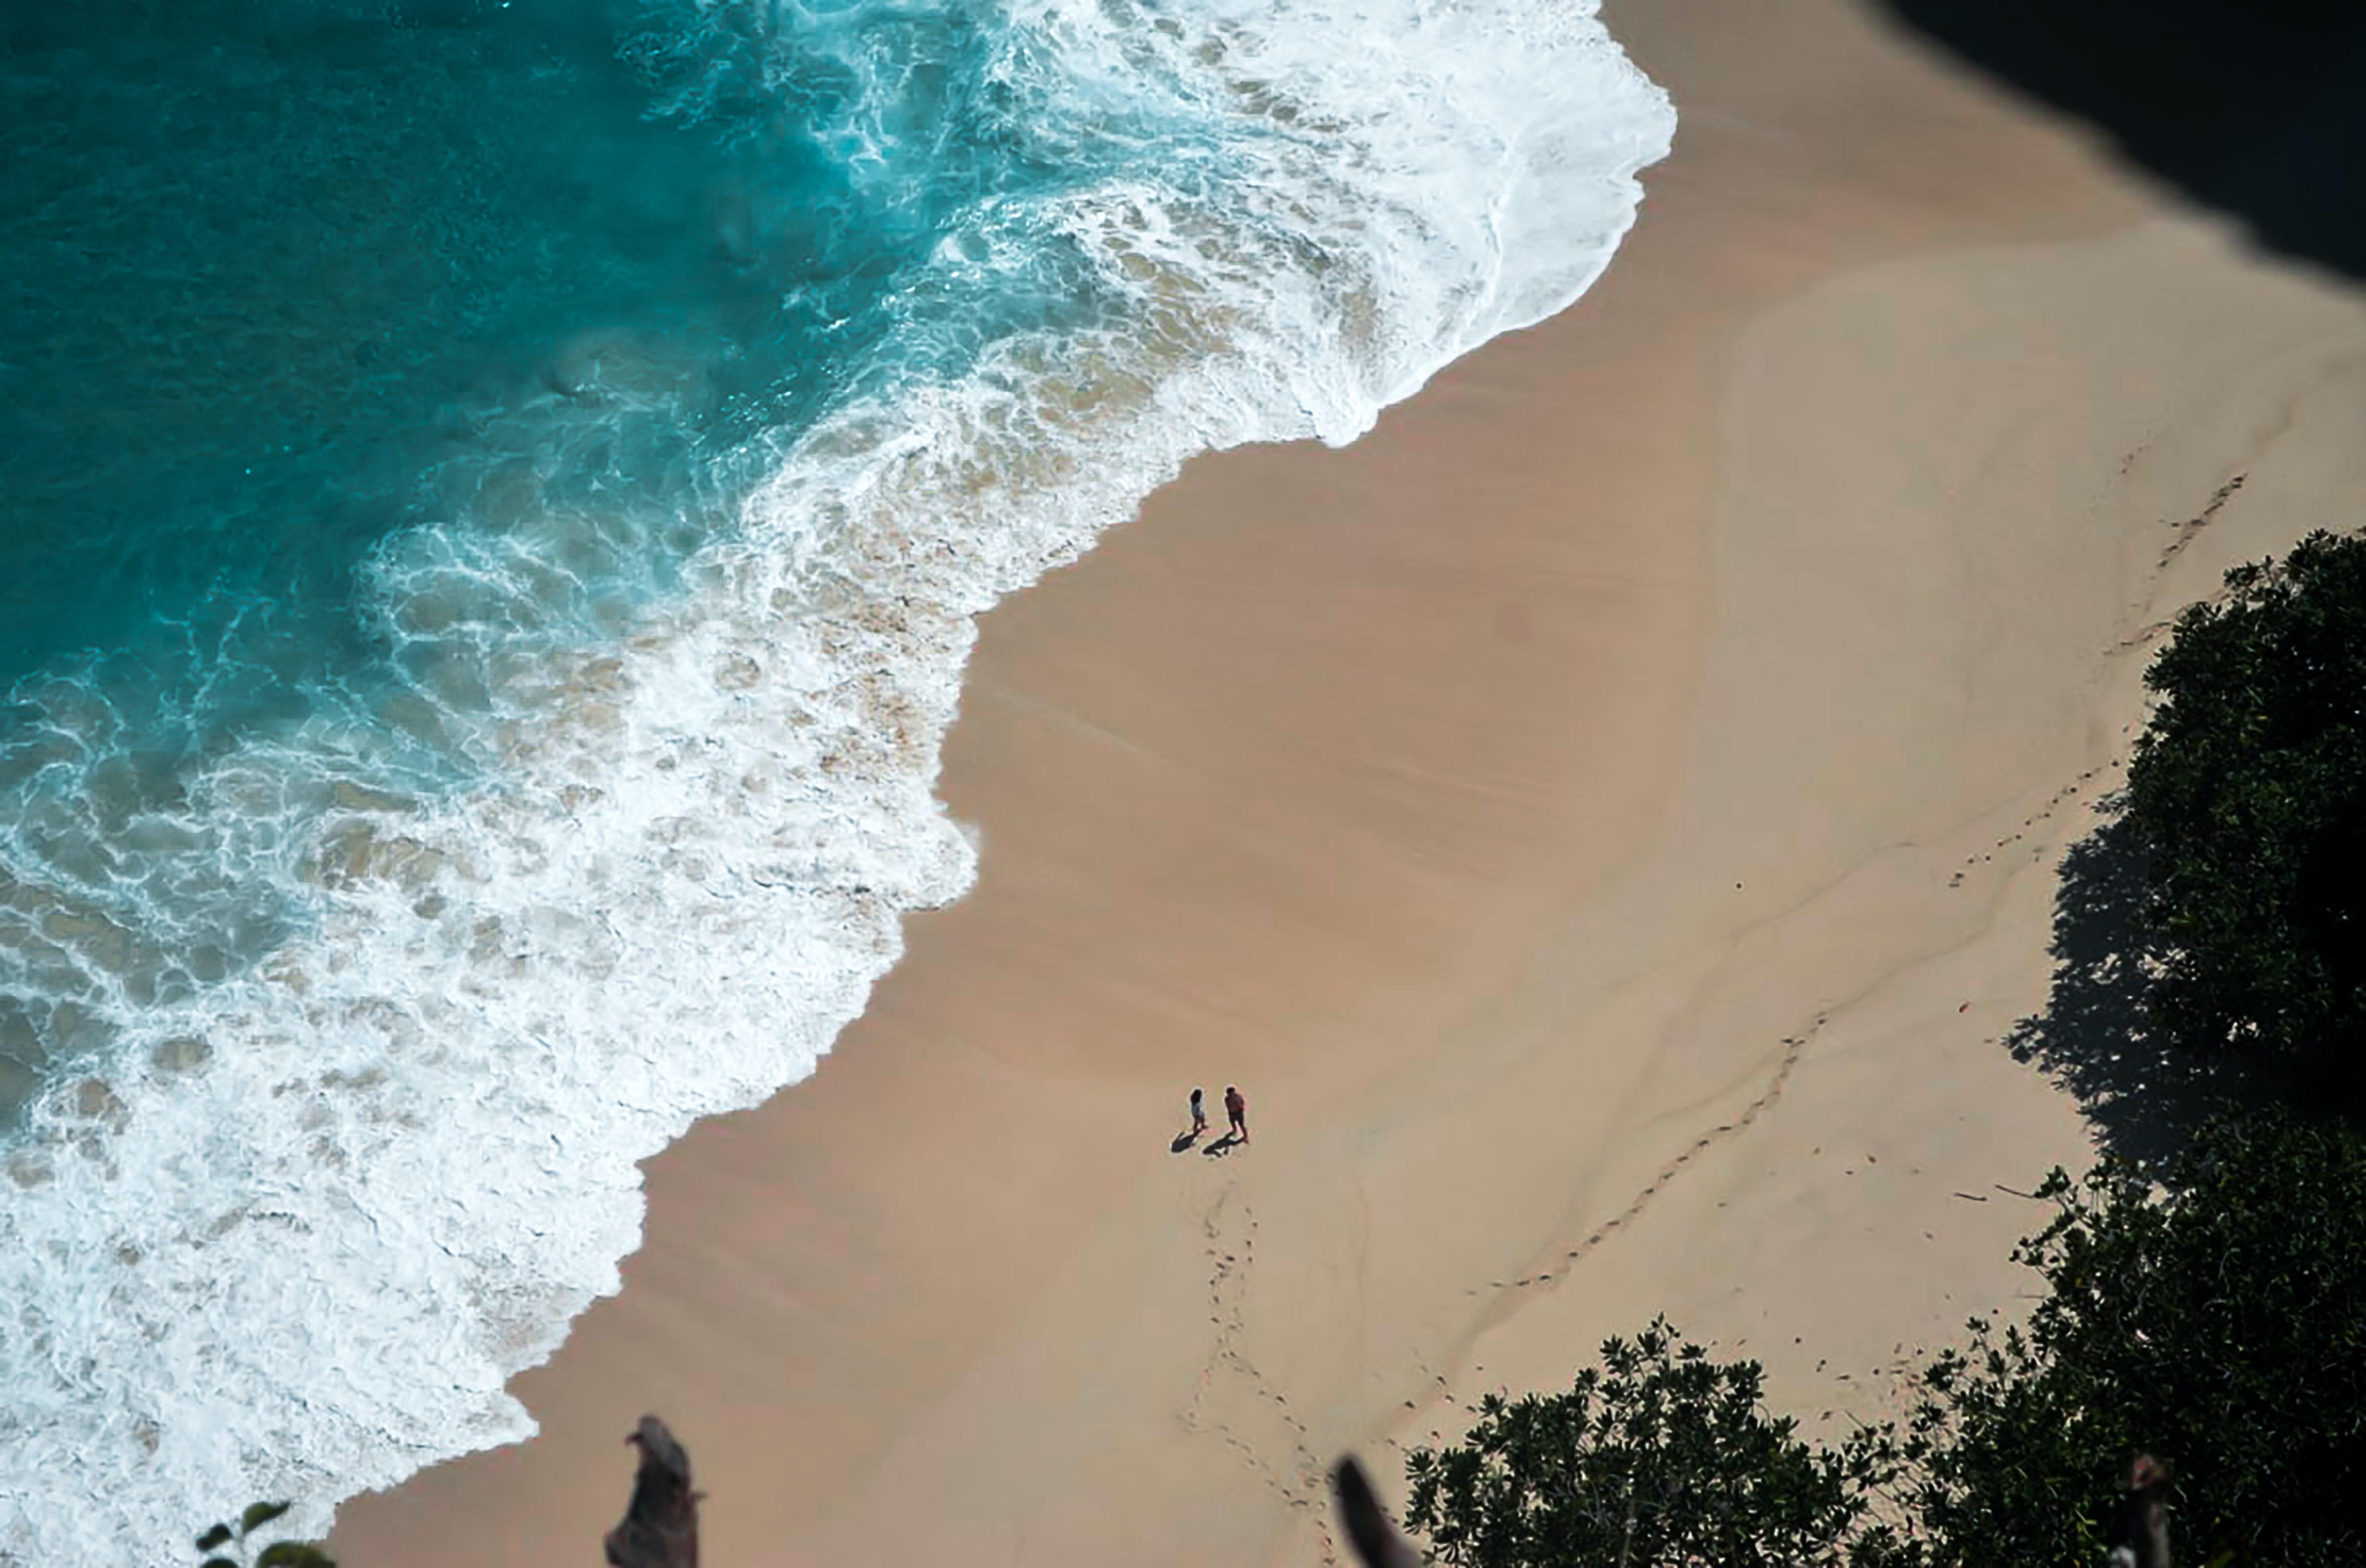 Nusa Penida, Klungkung Regency Bali, Indonesia, Plan your Bali Honeymoon from India